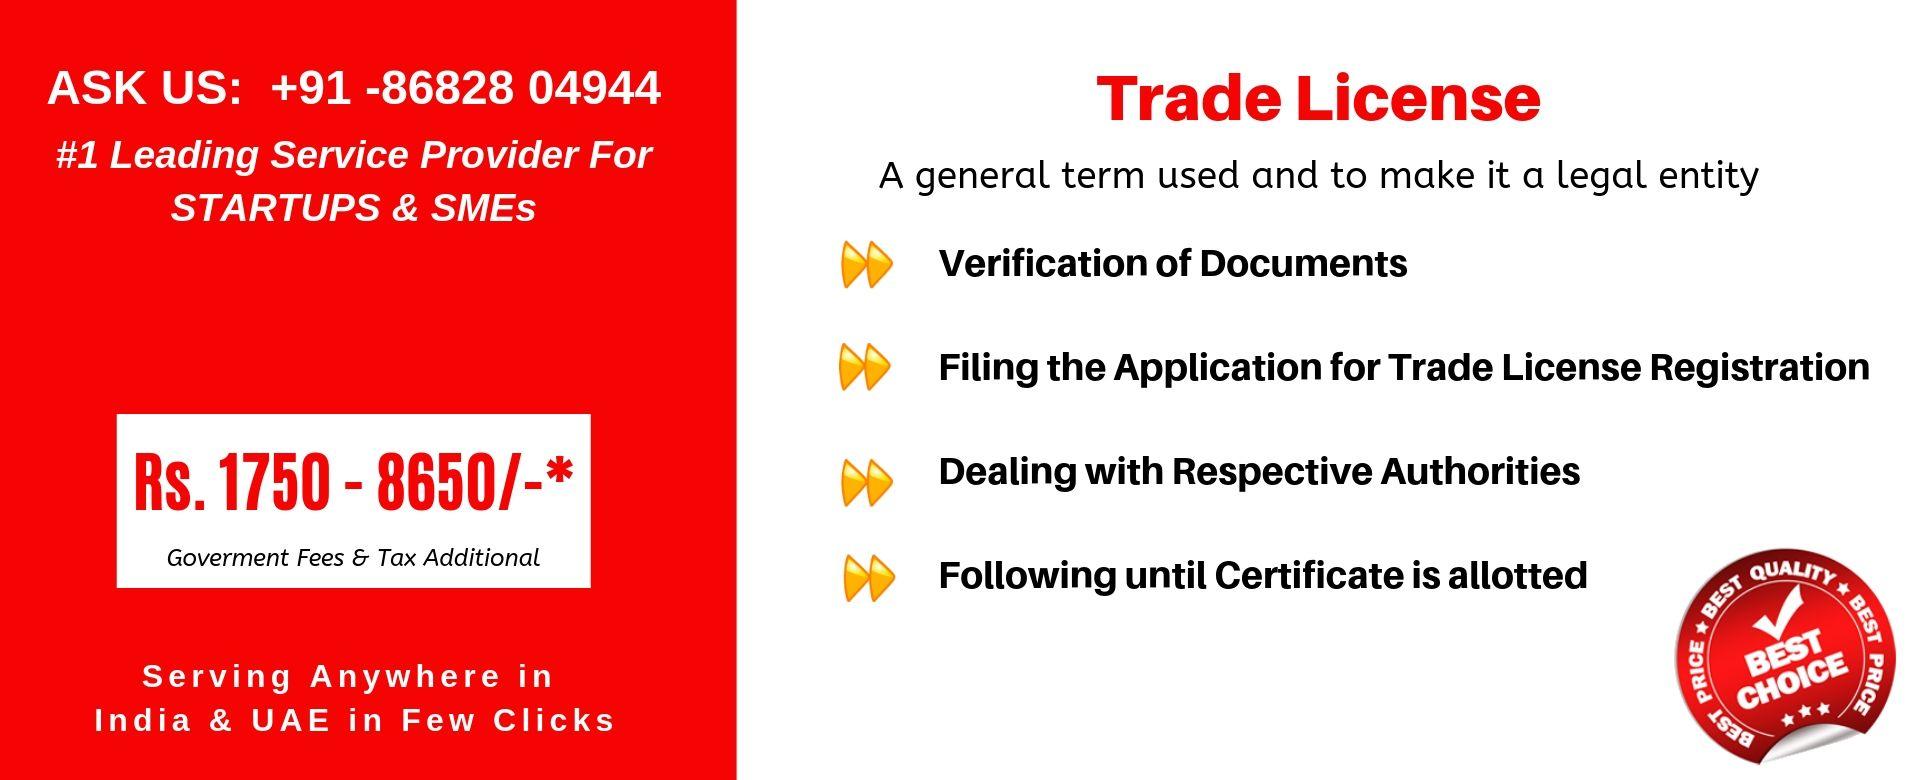 trade license in india